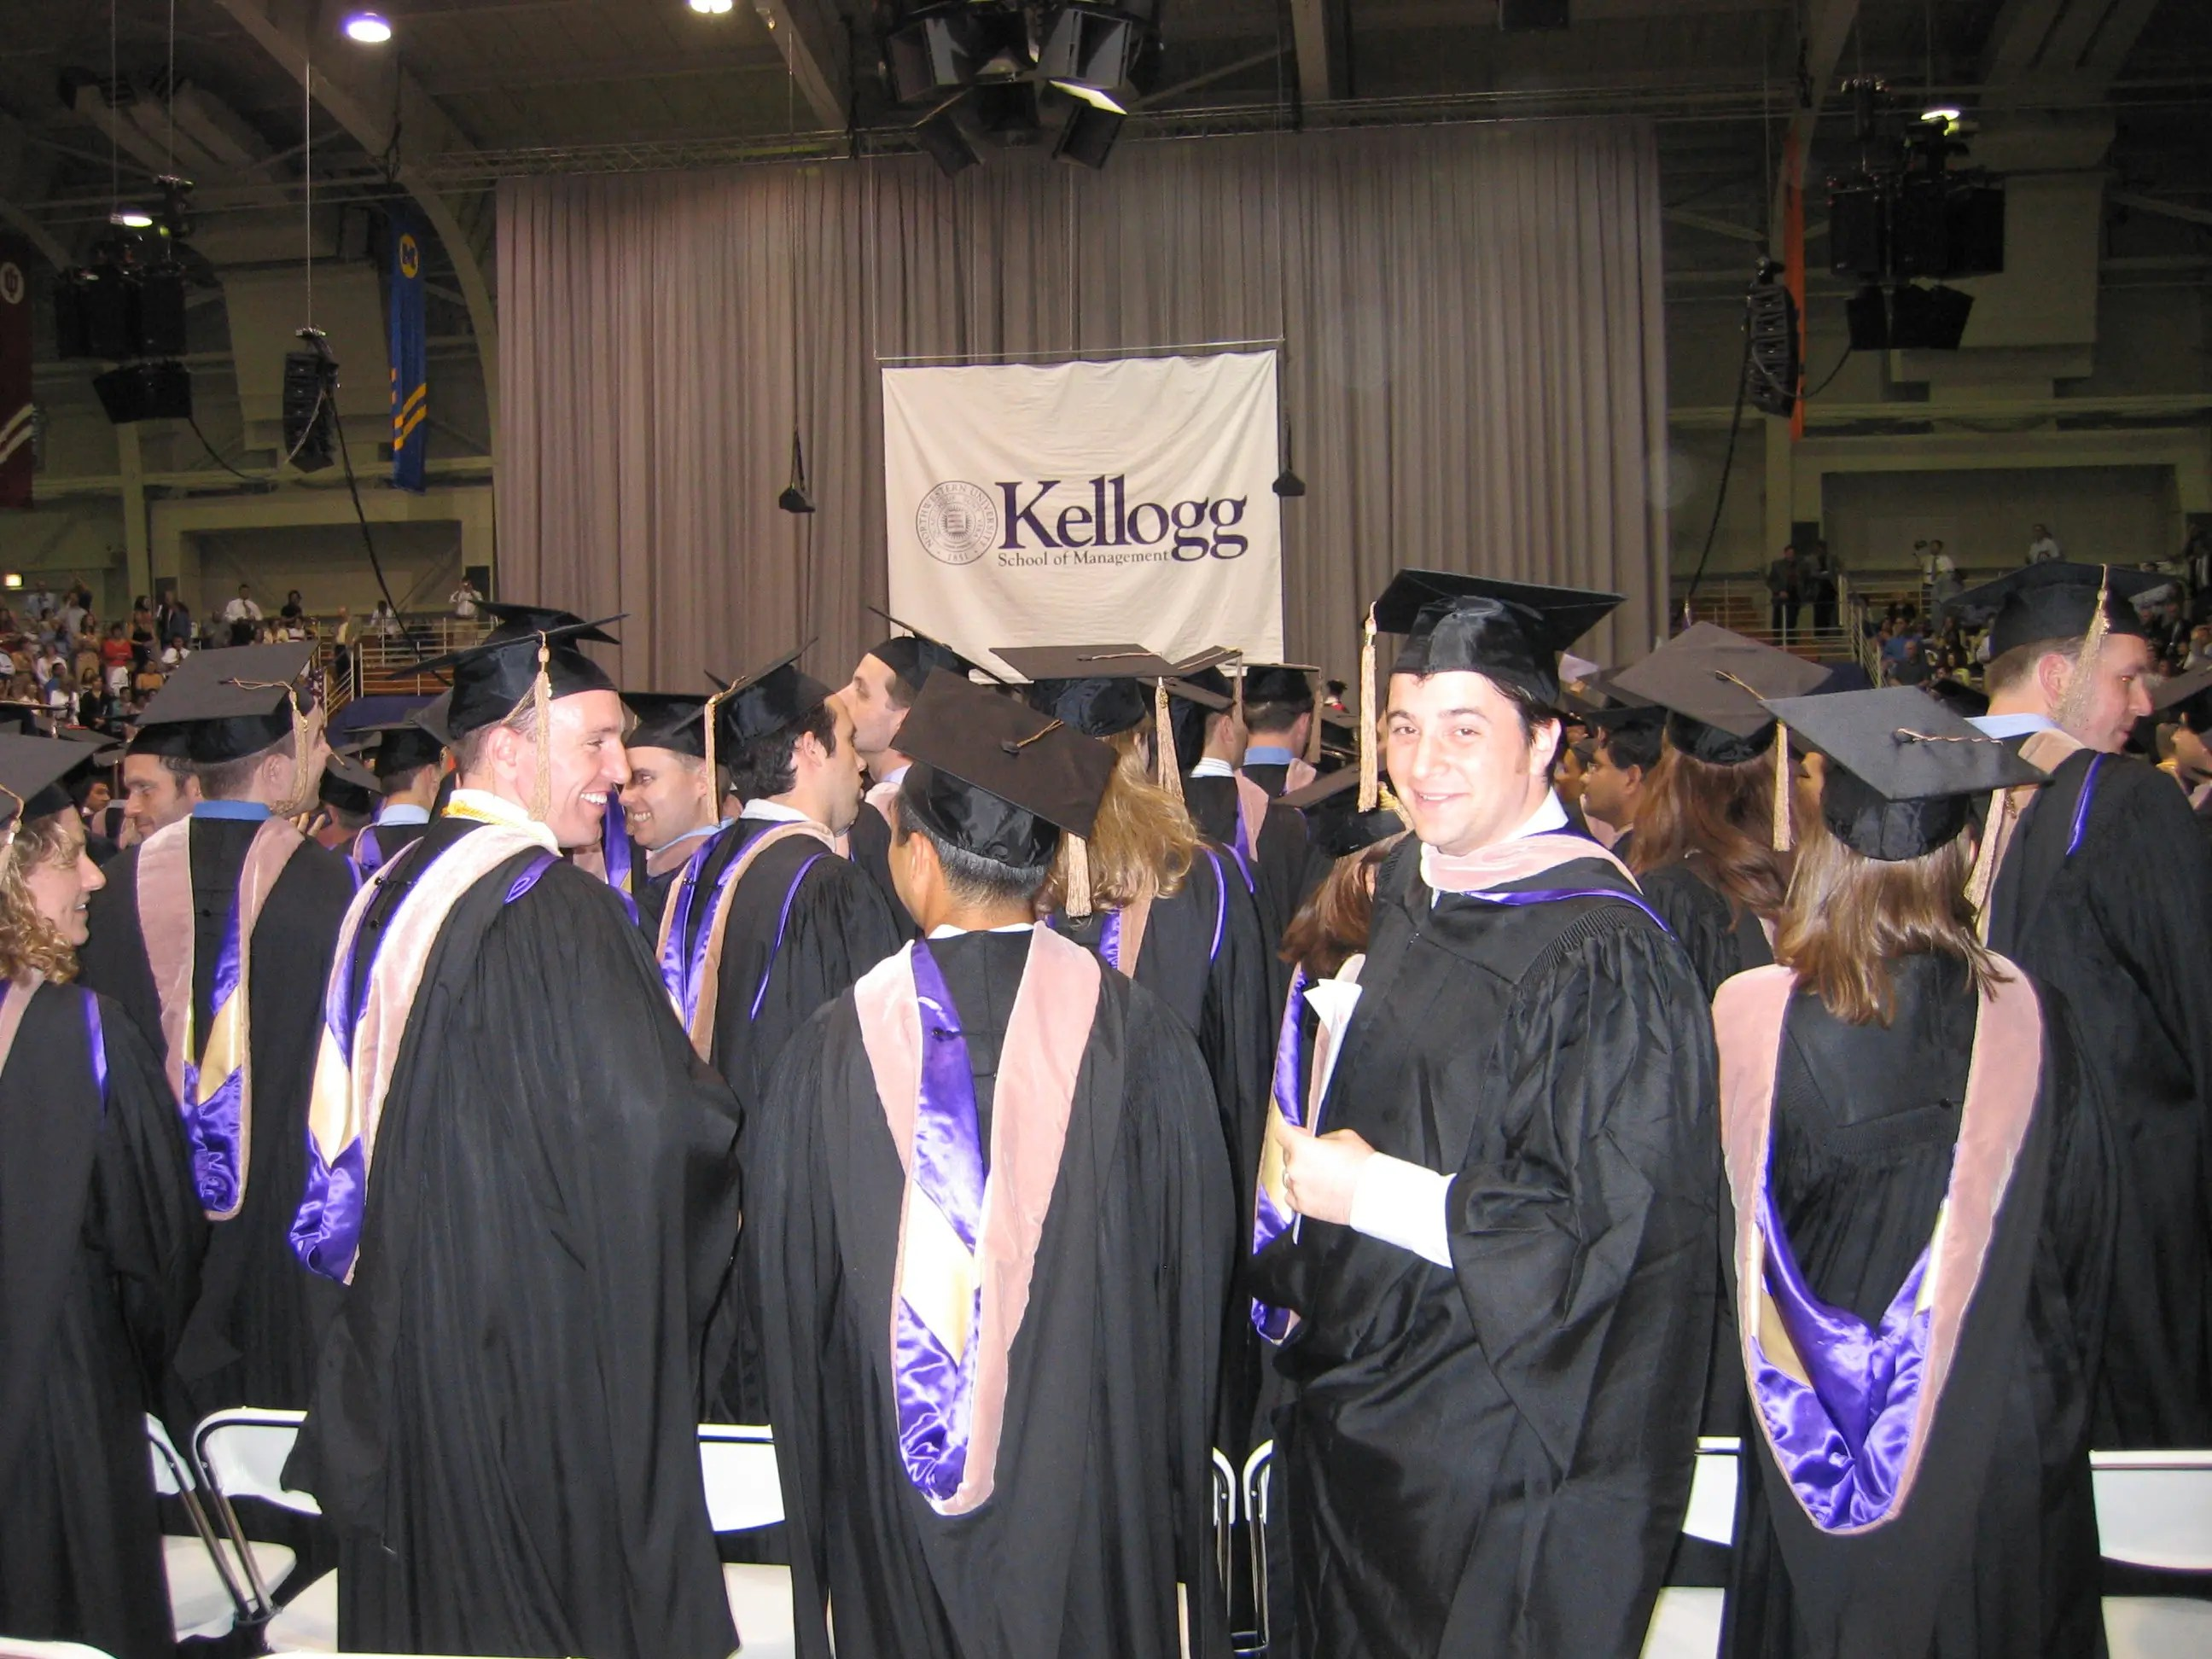 #11 Northwestern University (Kellogg)